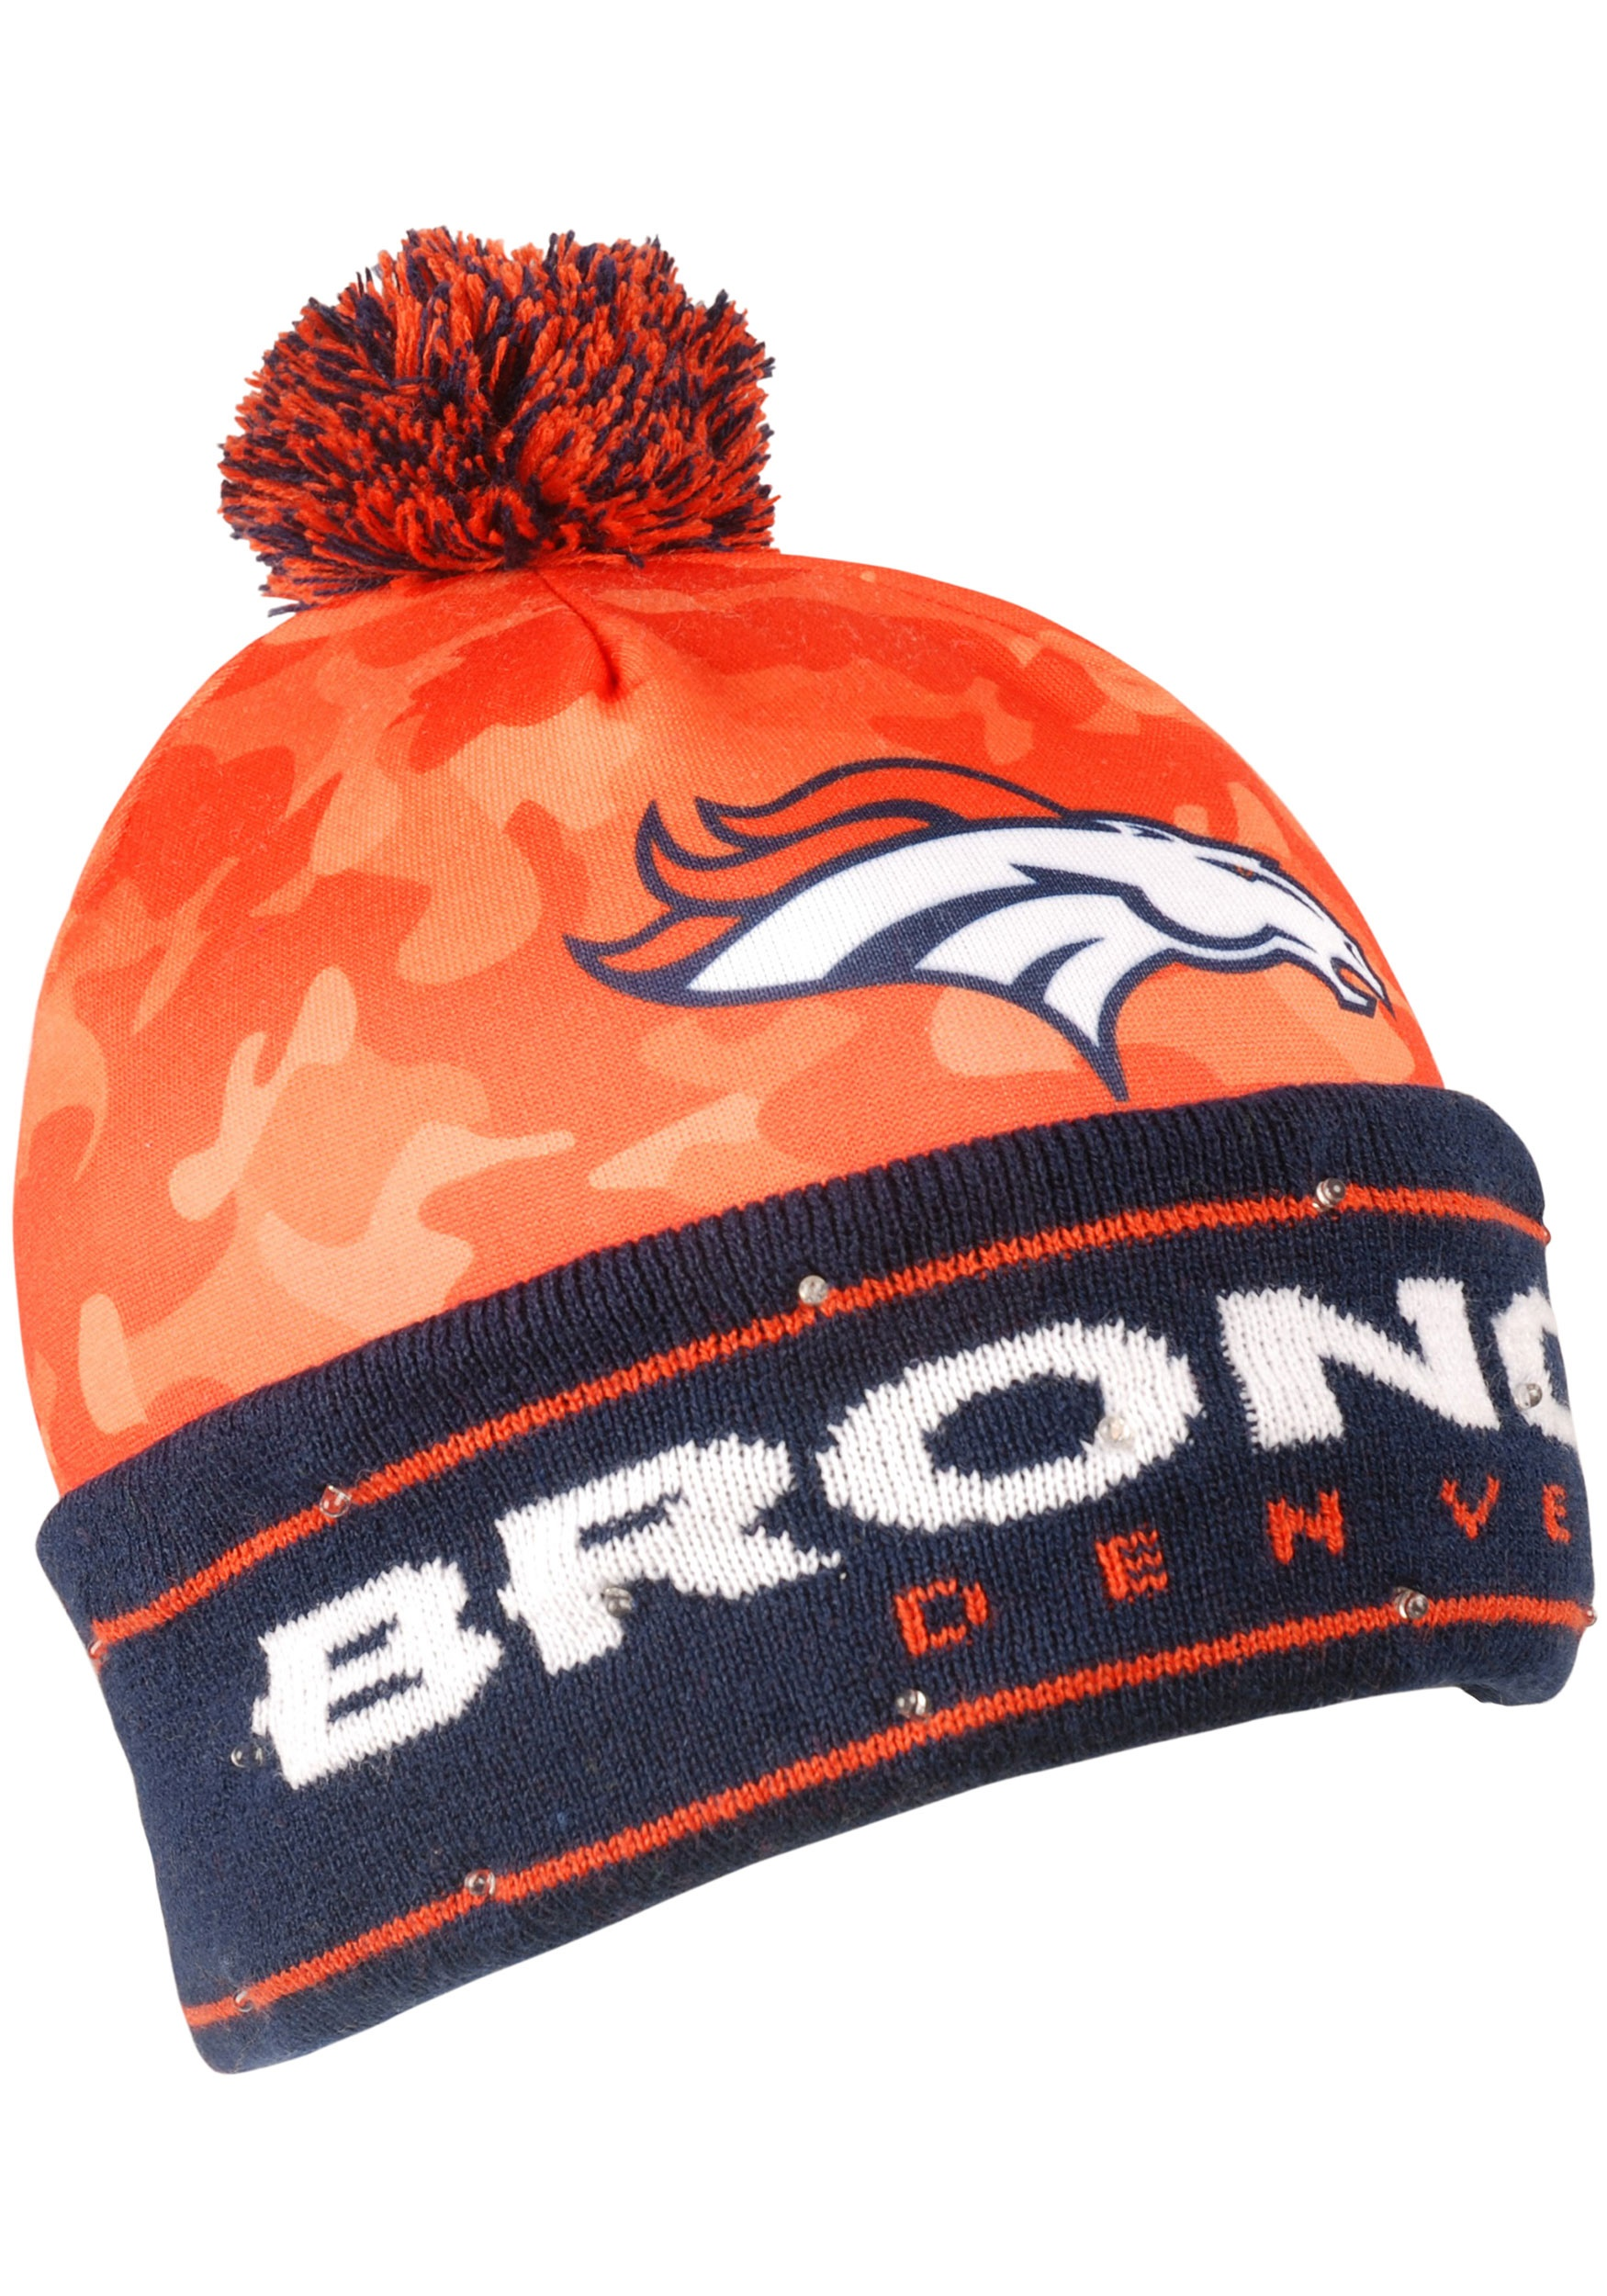 NFL Denver Broncos Camouflage Light Up Stocking Hat 55a2fee7a21